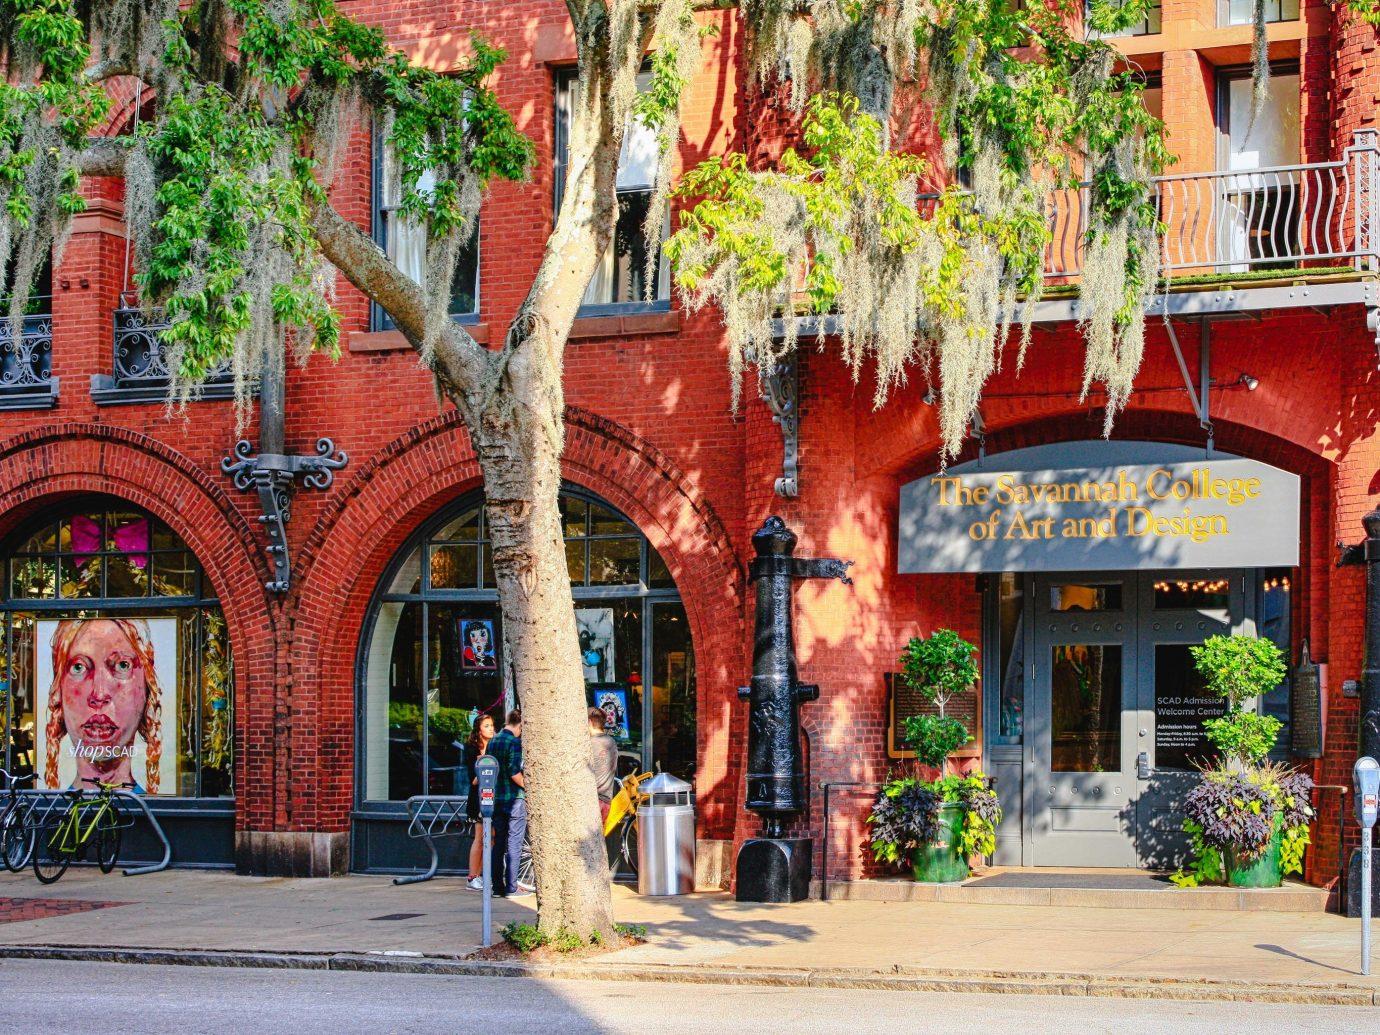 Girls Getaways Trip Ideas Weekend Getaways neighbourhood Town City house tree facade street home real estate mixed use window building plant